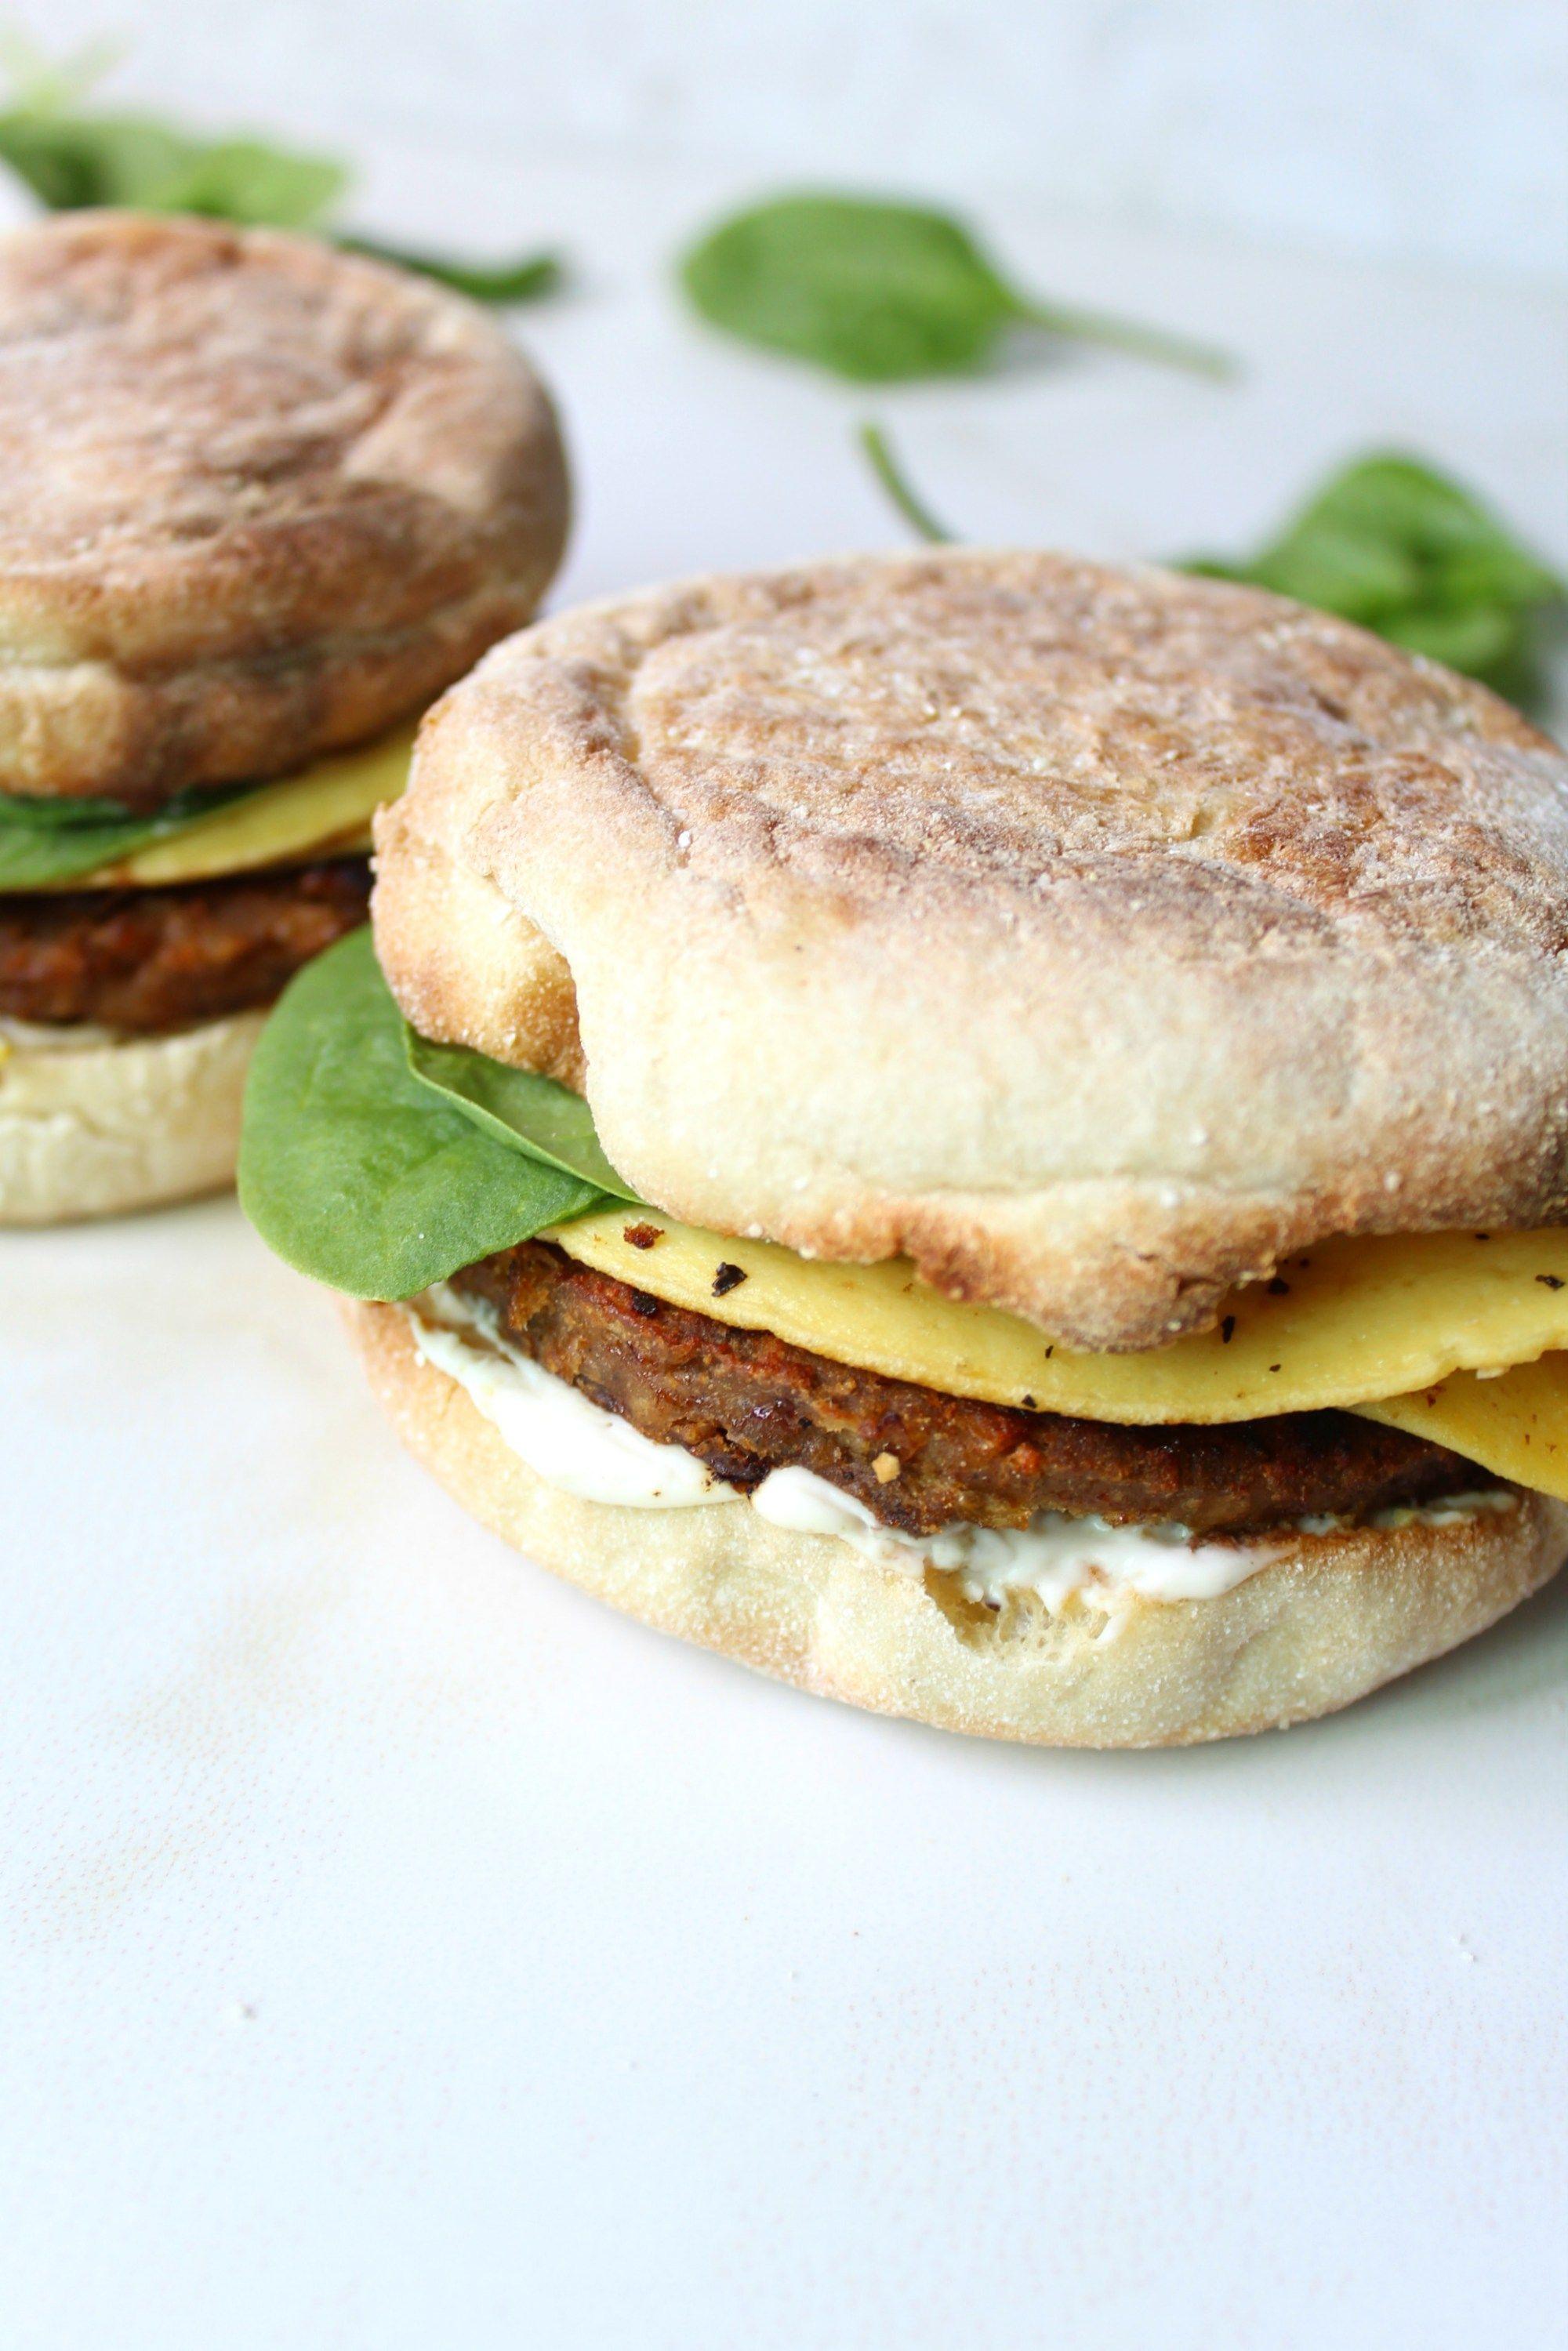 The Best Vegan Breakfast Sandwiches This Savory Vegan Recipe Savory Vegan Breakfast Sandwich Best Vegan Breakfast